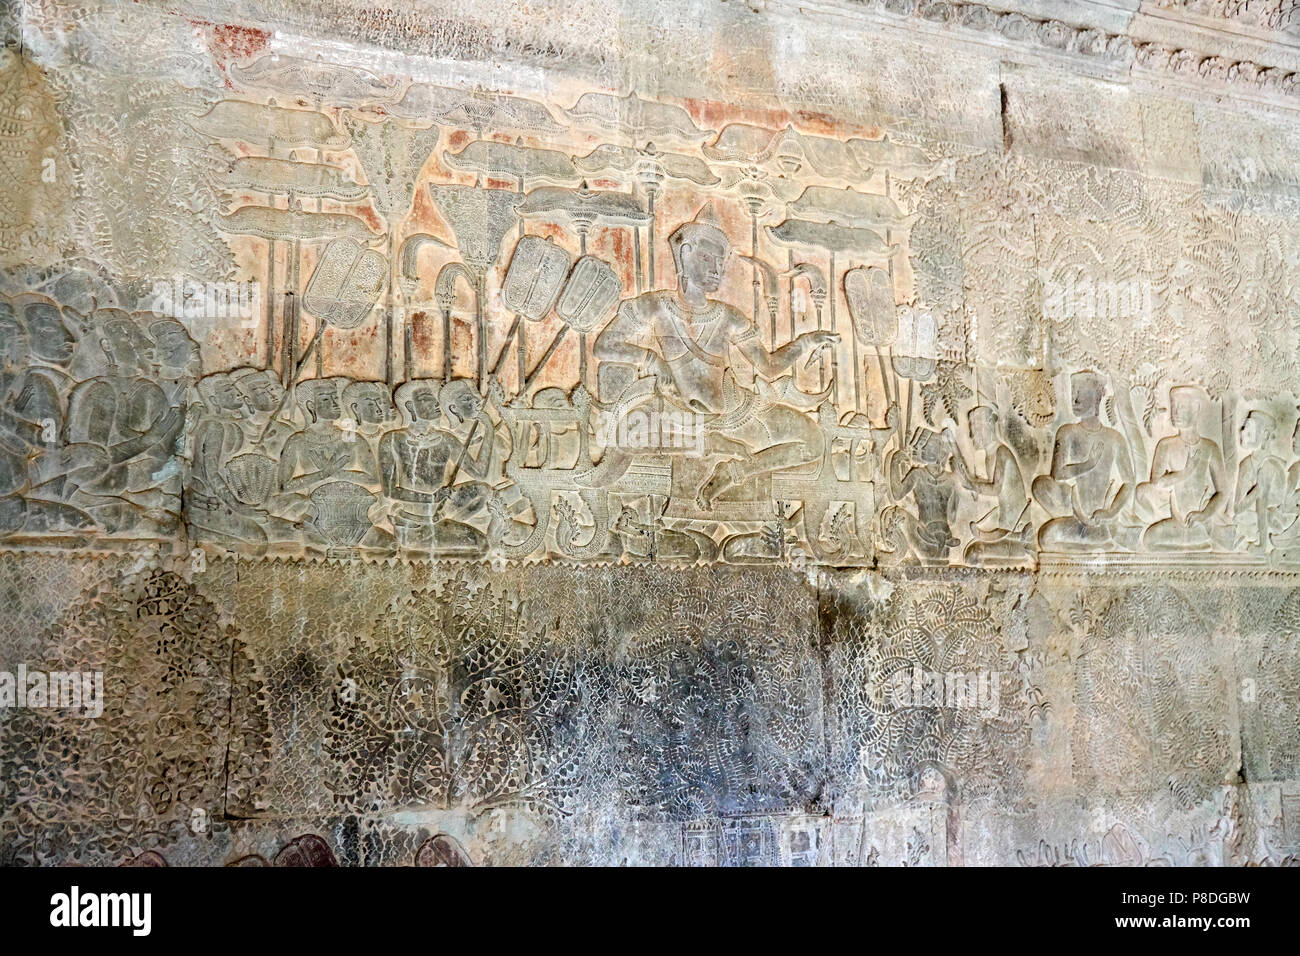 Detail of bas-relief at Angkor Wat, Siem Reap, Cambodia - Stock Image